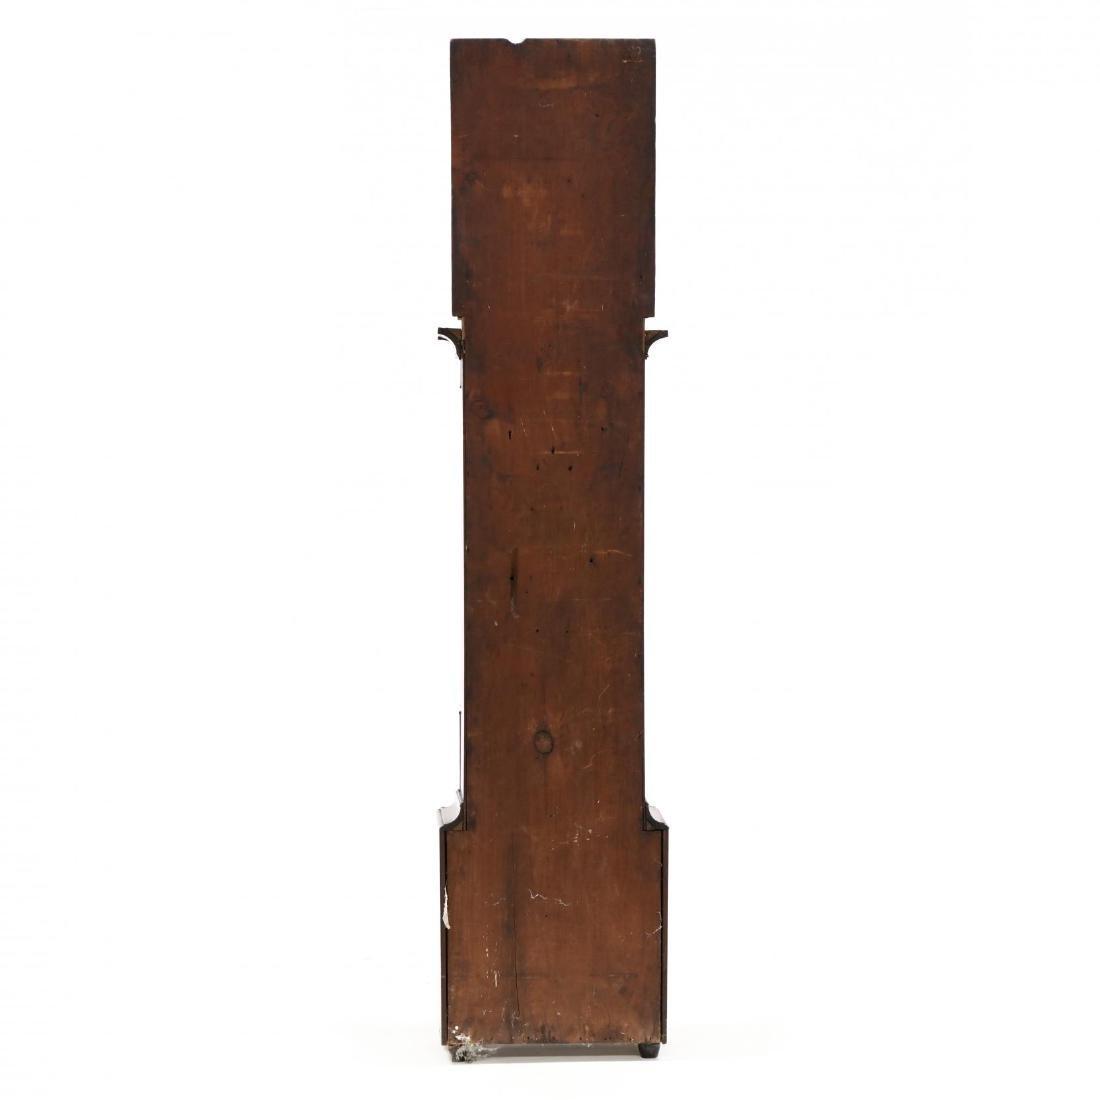 Scottish Mahogany Tall Case Clock, Hay Mercer, Aberdeen - 10